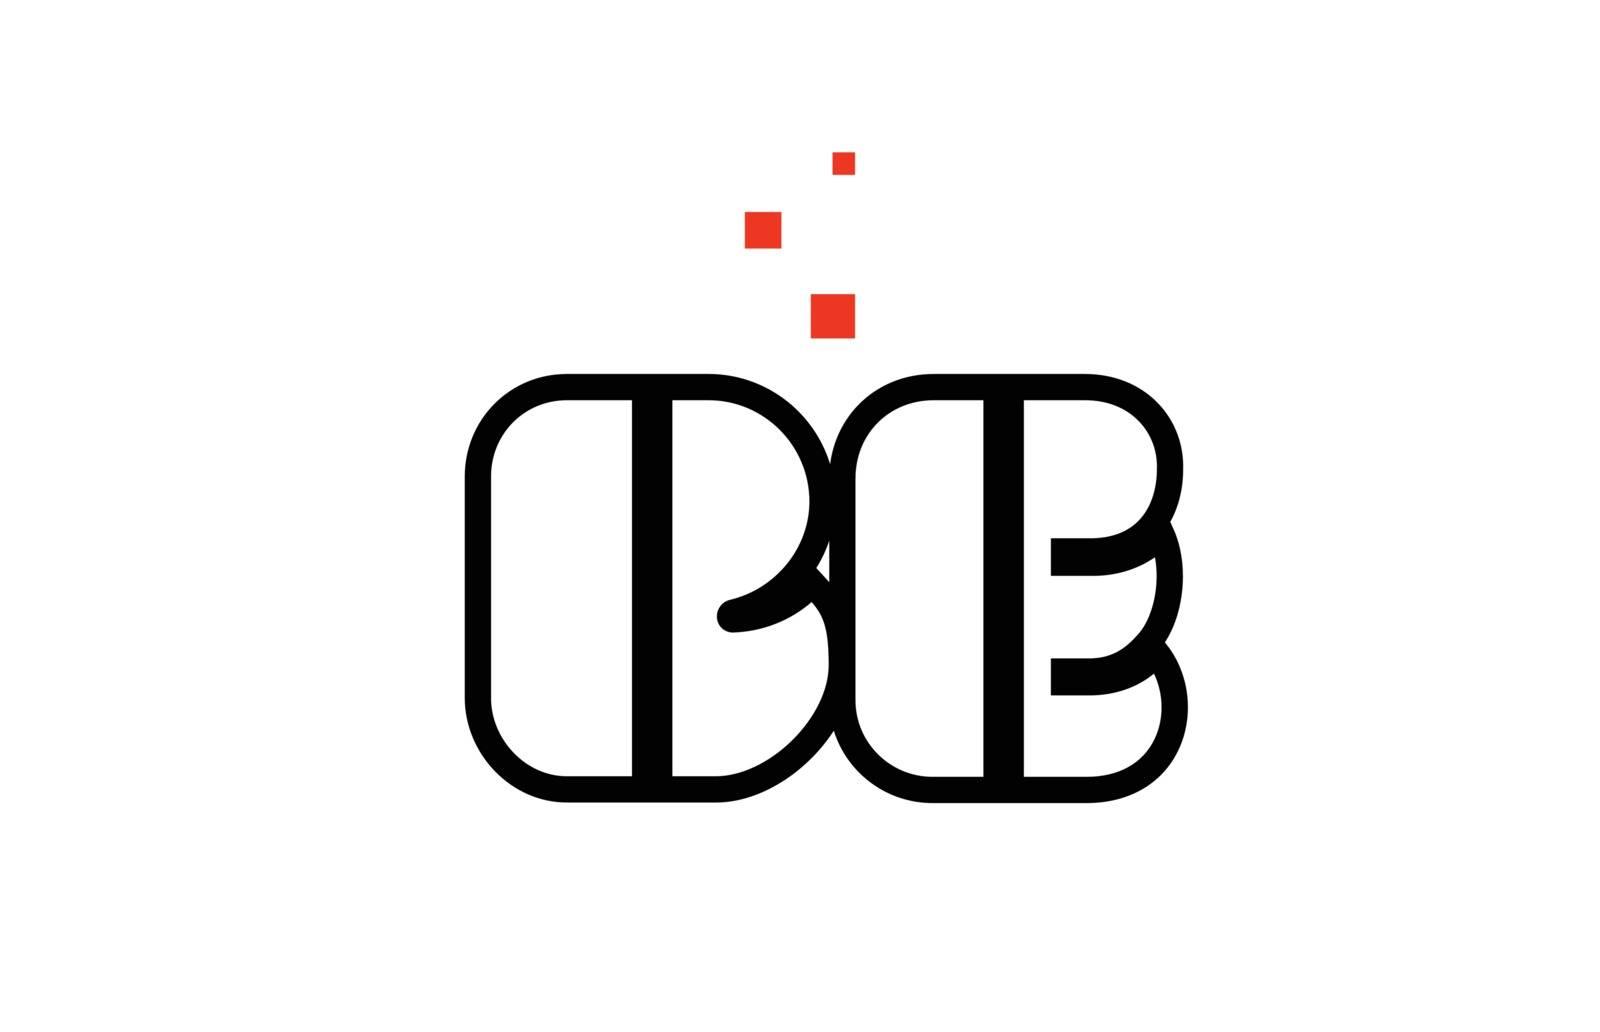 BE B E black white red alphabet letter combination logo icon des by dragomirescu